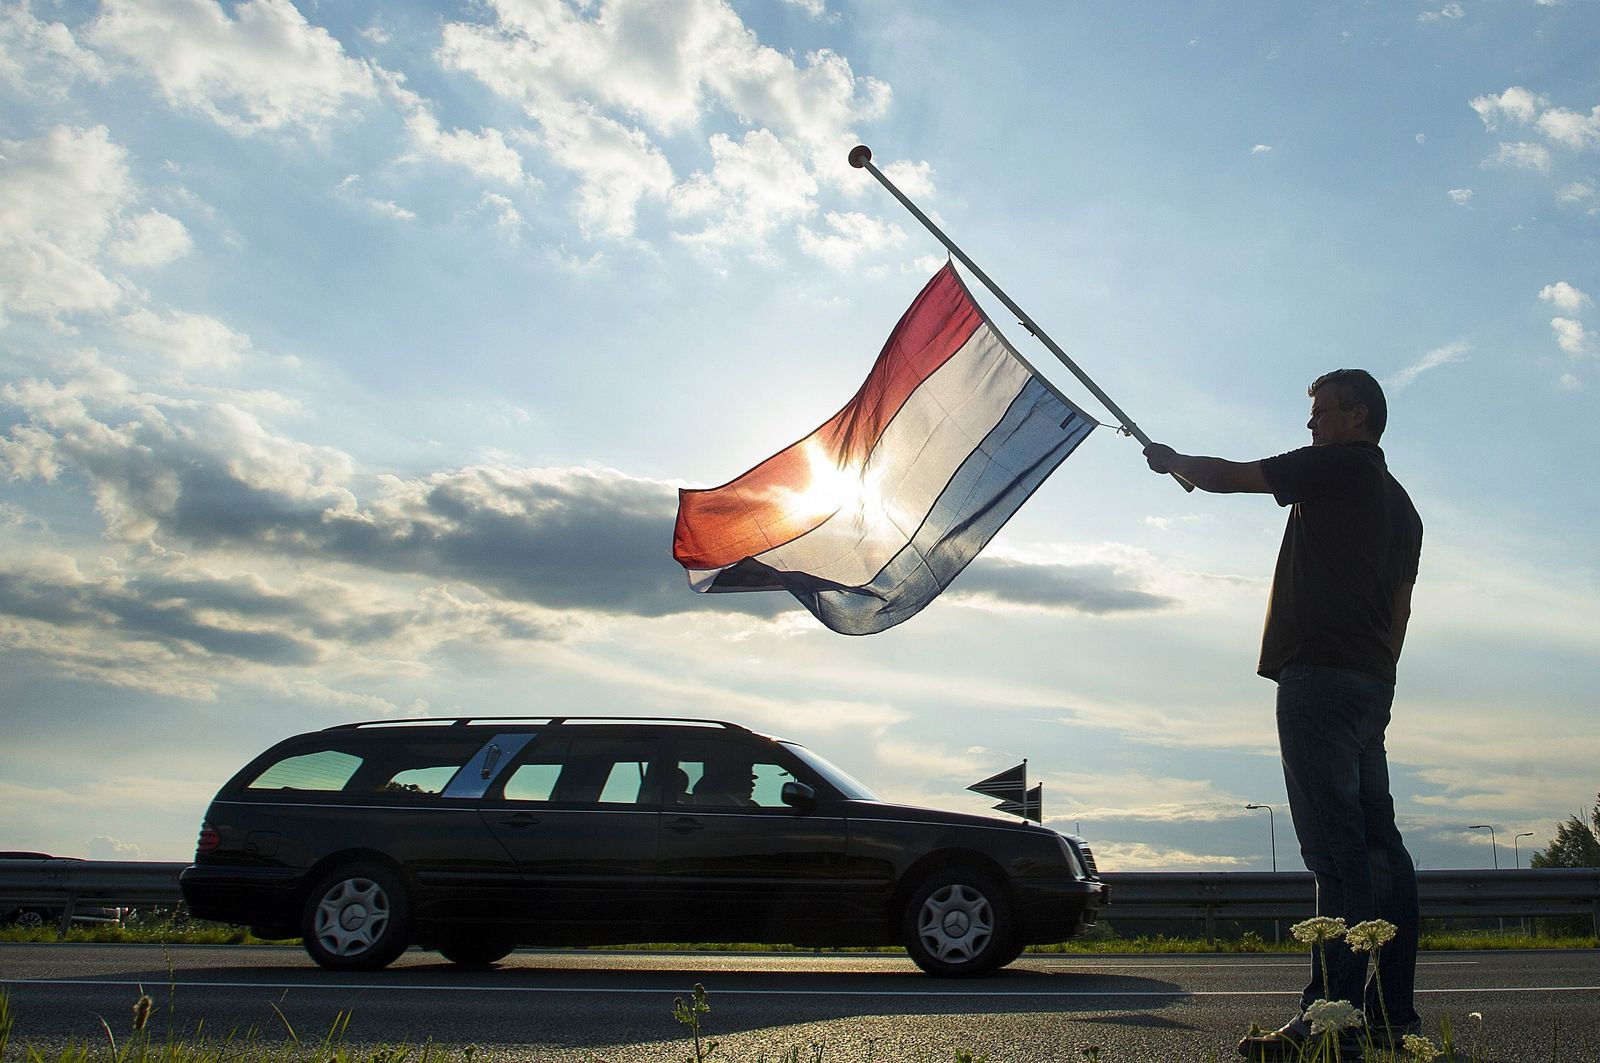 Netherlands/ Ukraine/ MH17